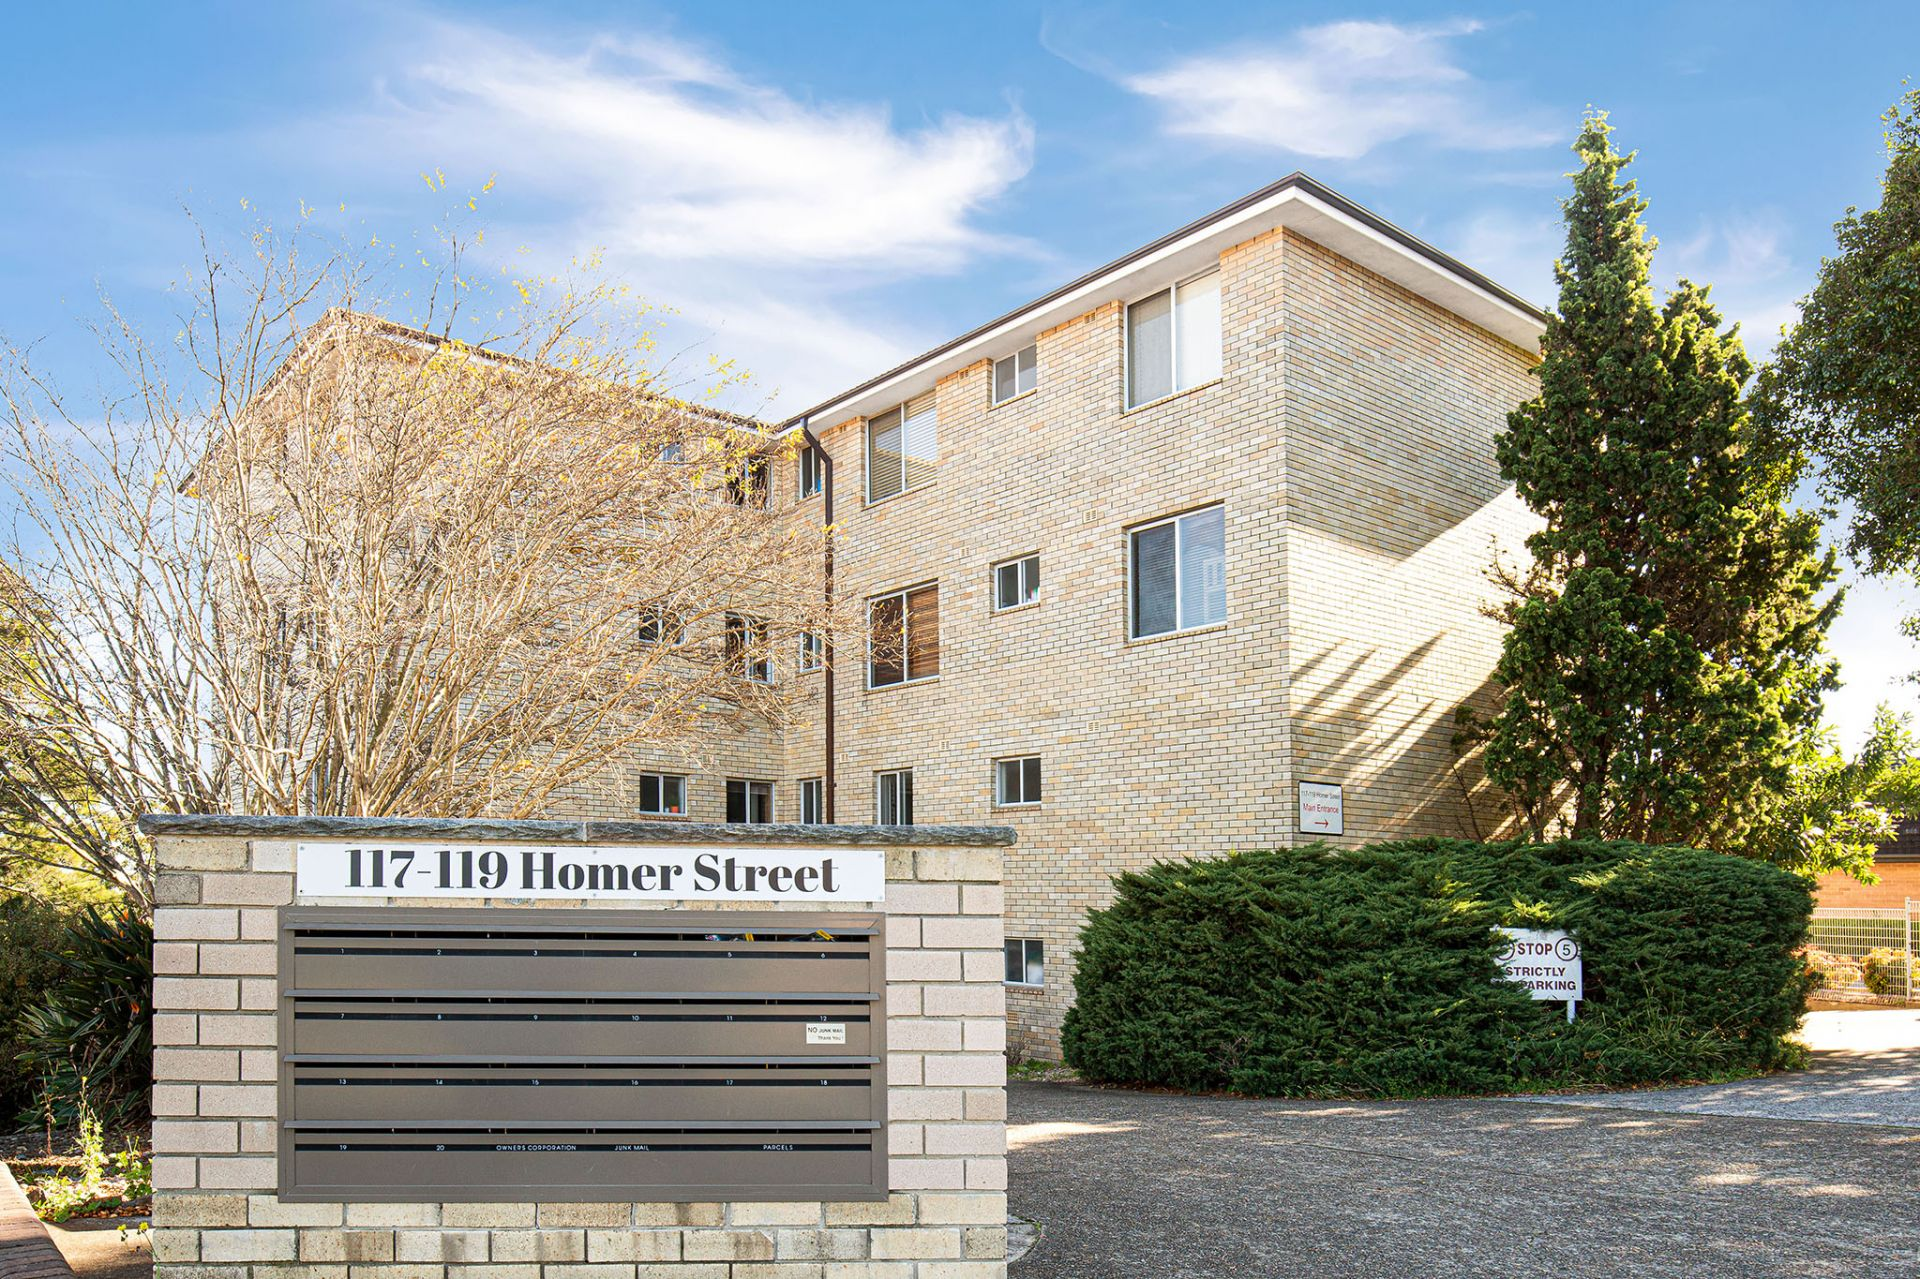 12/117 Homer Street, Earlwood